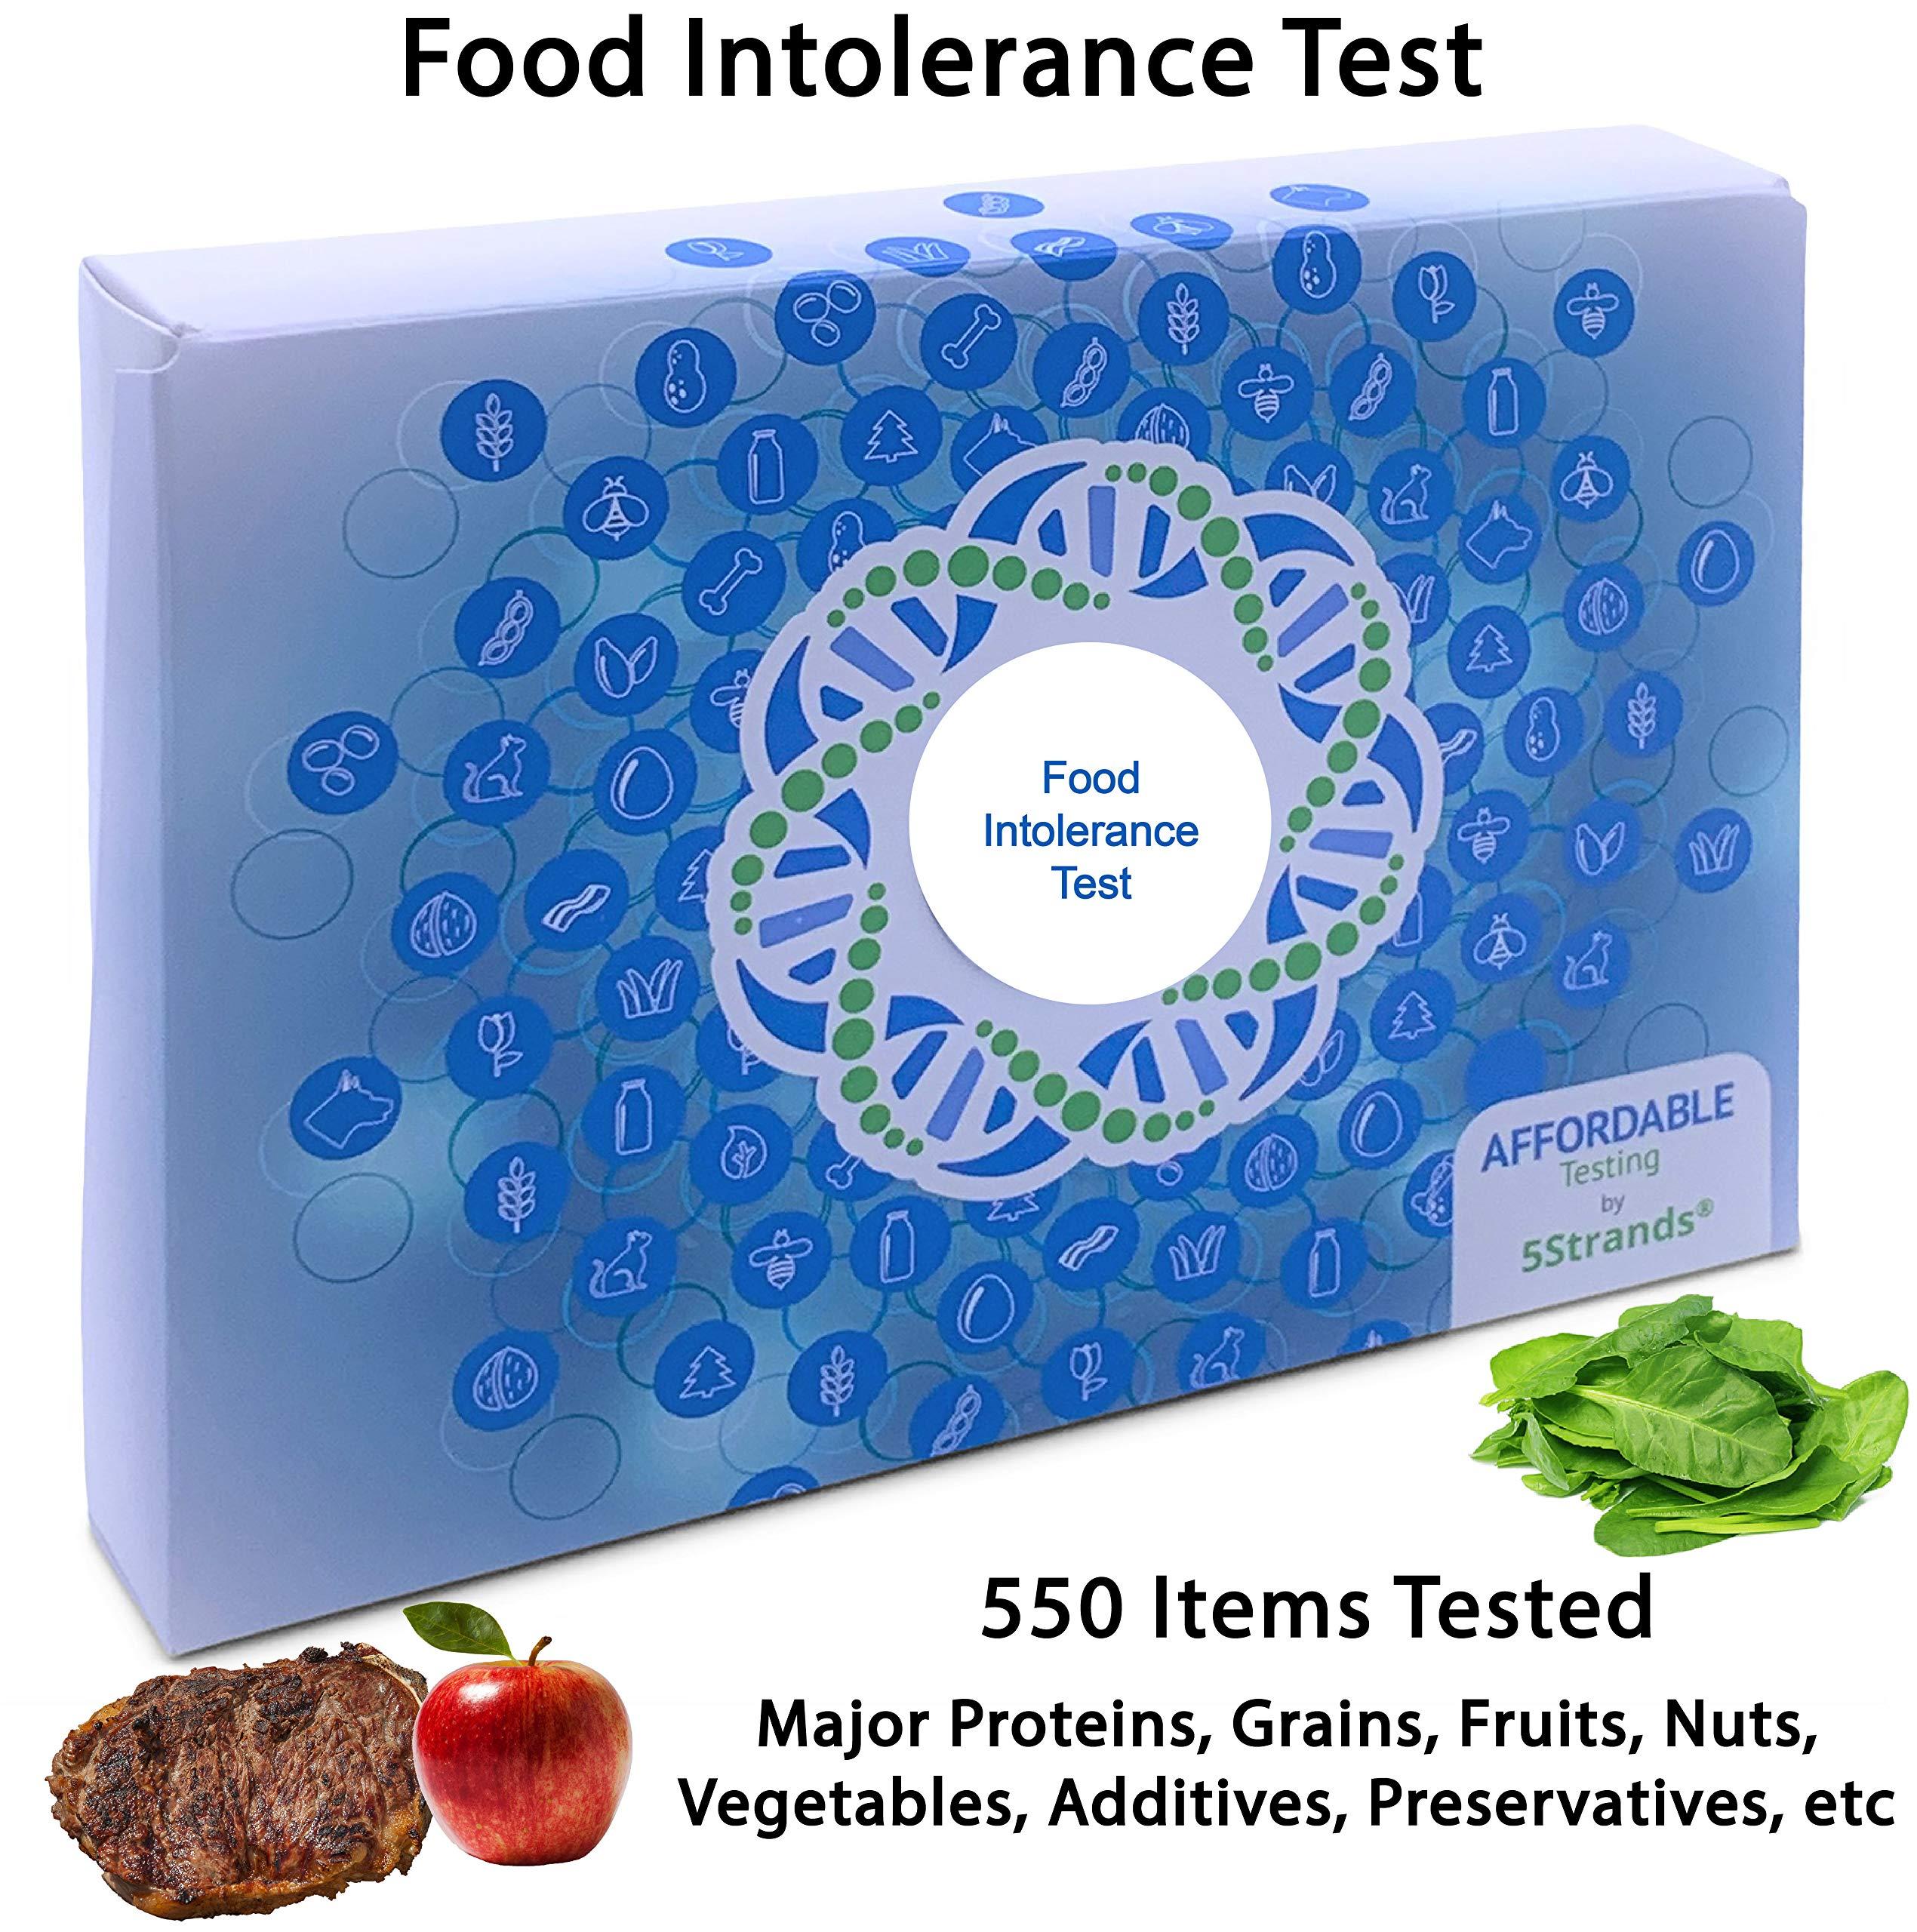 5Strands Affordable Intolerance Intolerances Sensitivities